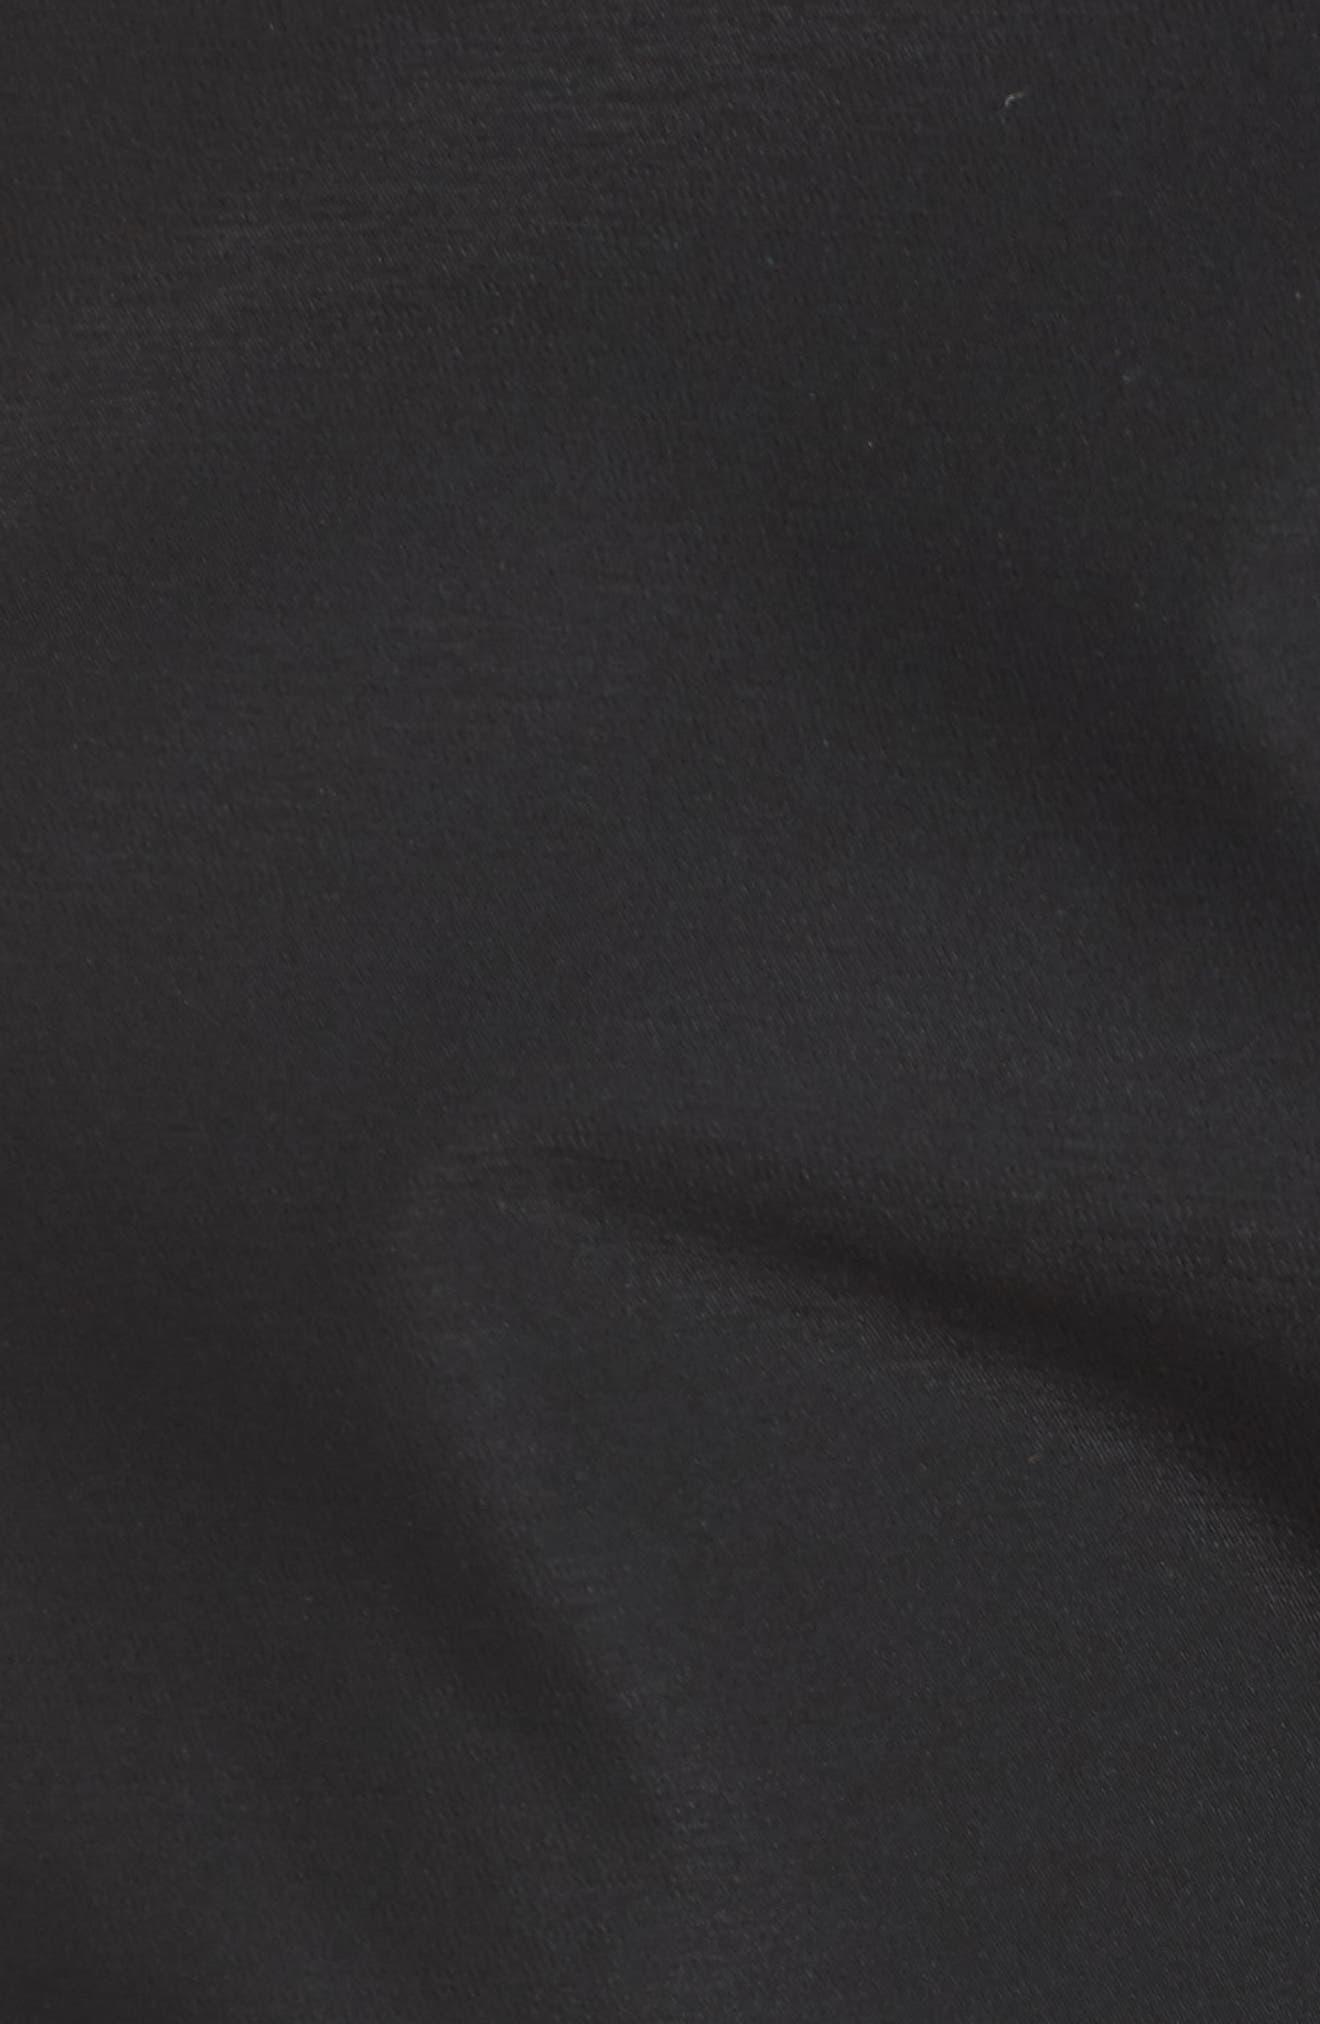 NIKE,                             NikeLab x MMW Women's Pants,                             Alternate thumbnail 6, color,                             010